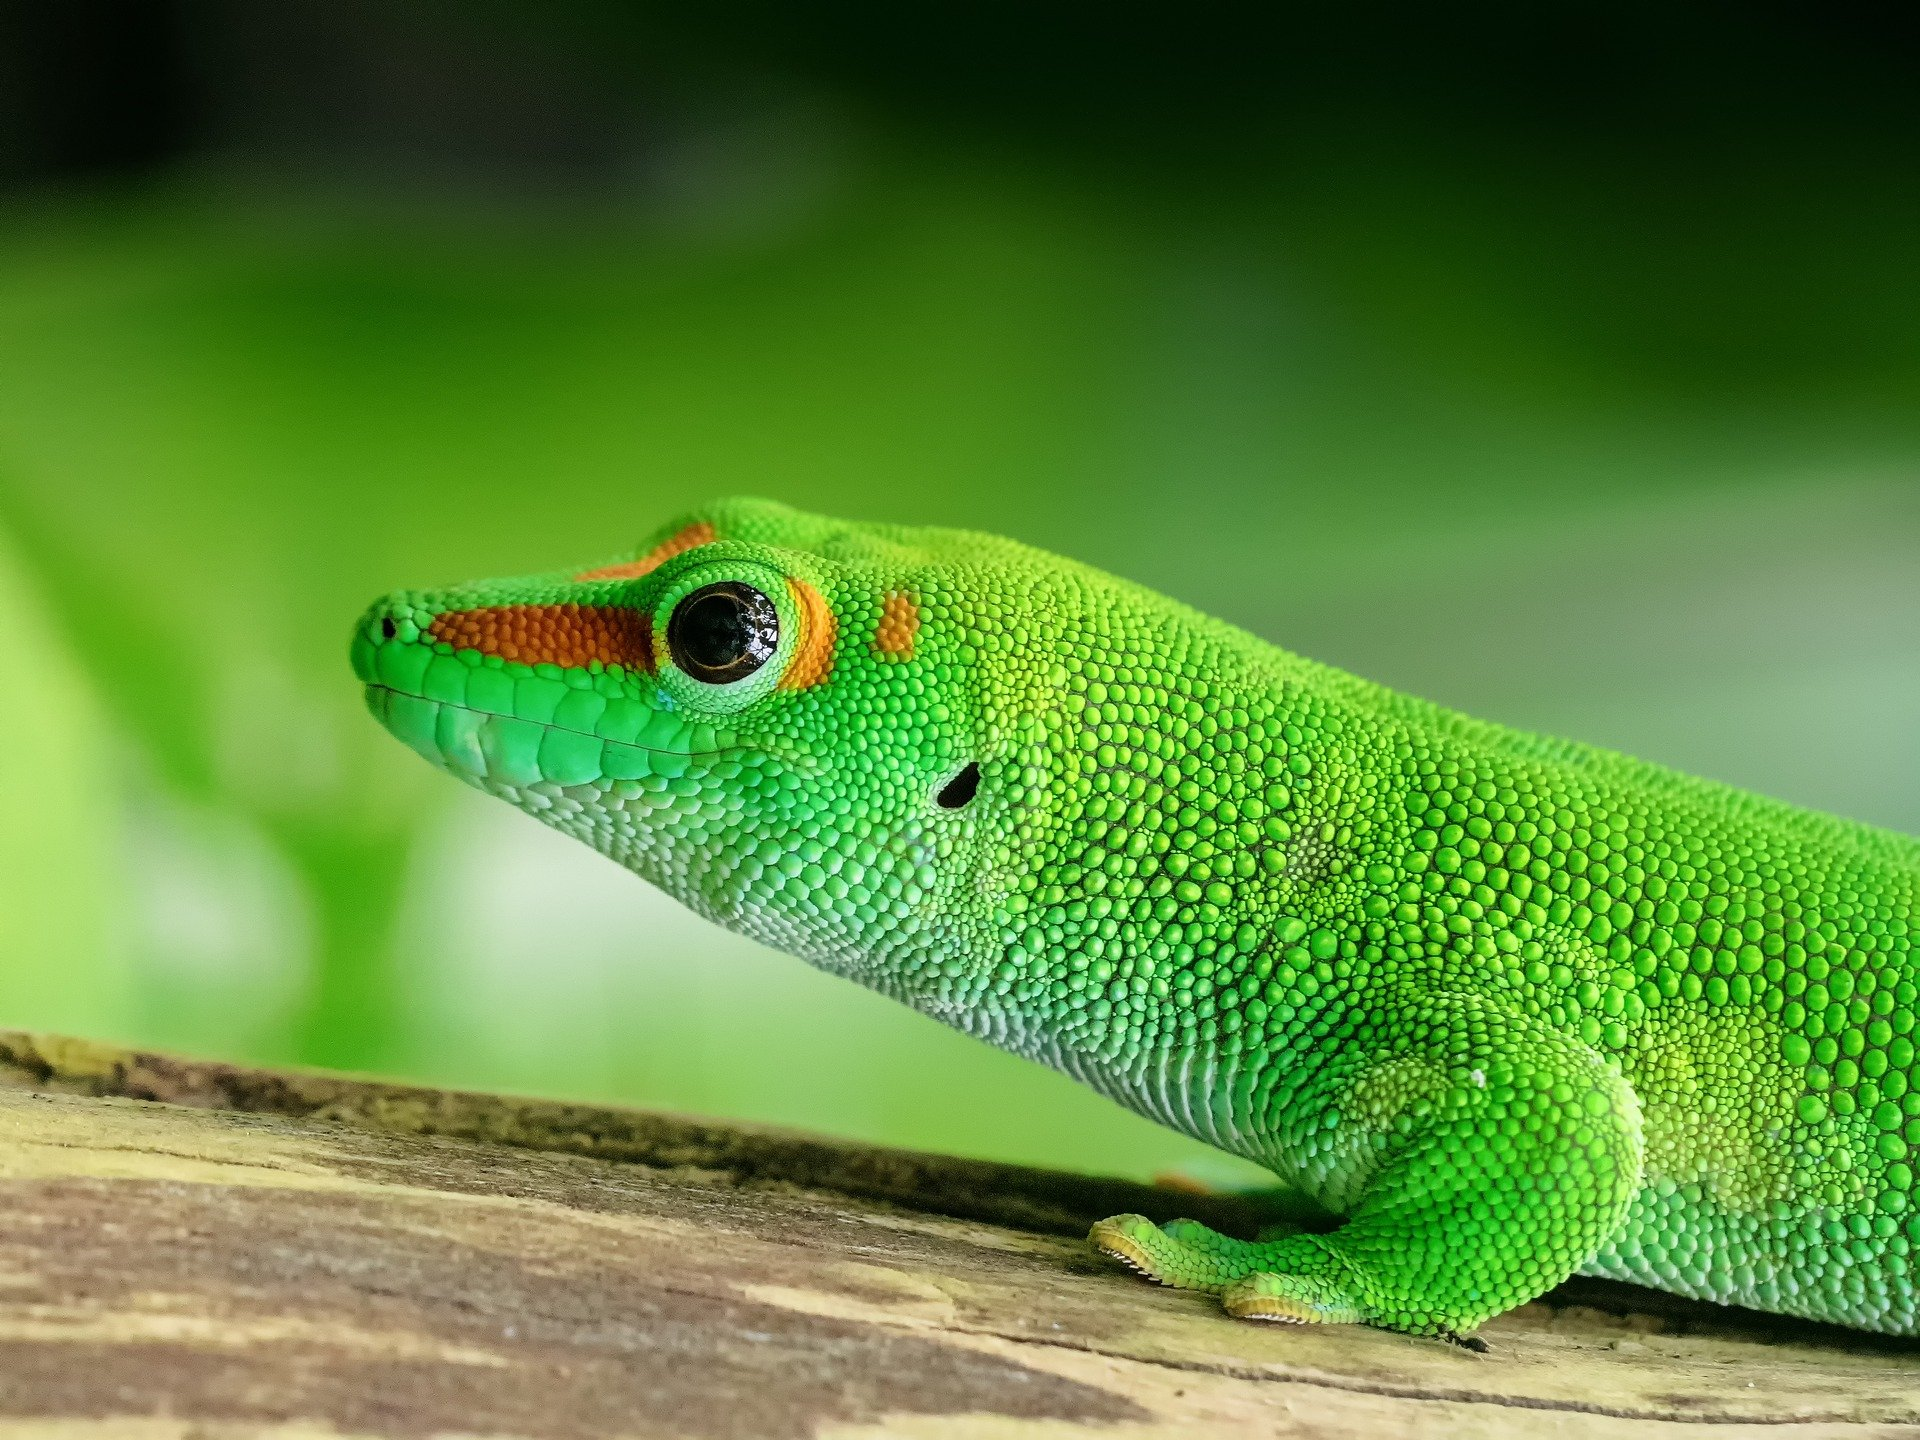 Madagaskar Taggecko, Madagasar daygecko, Madagaskar Taggecko Haltung